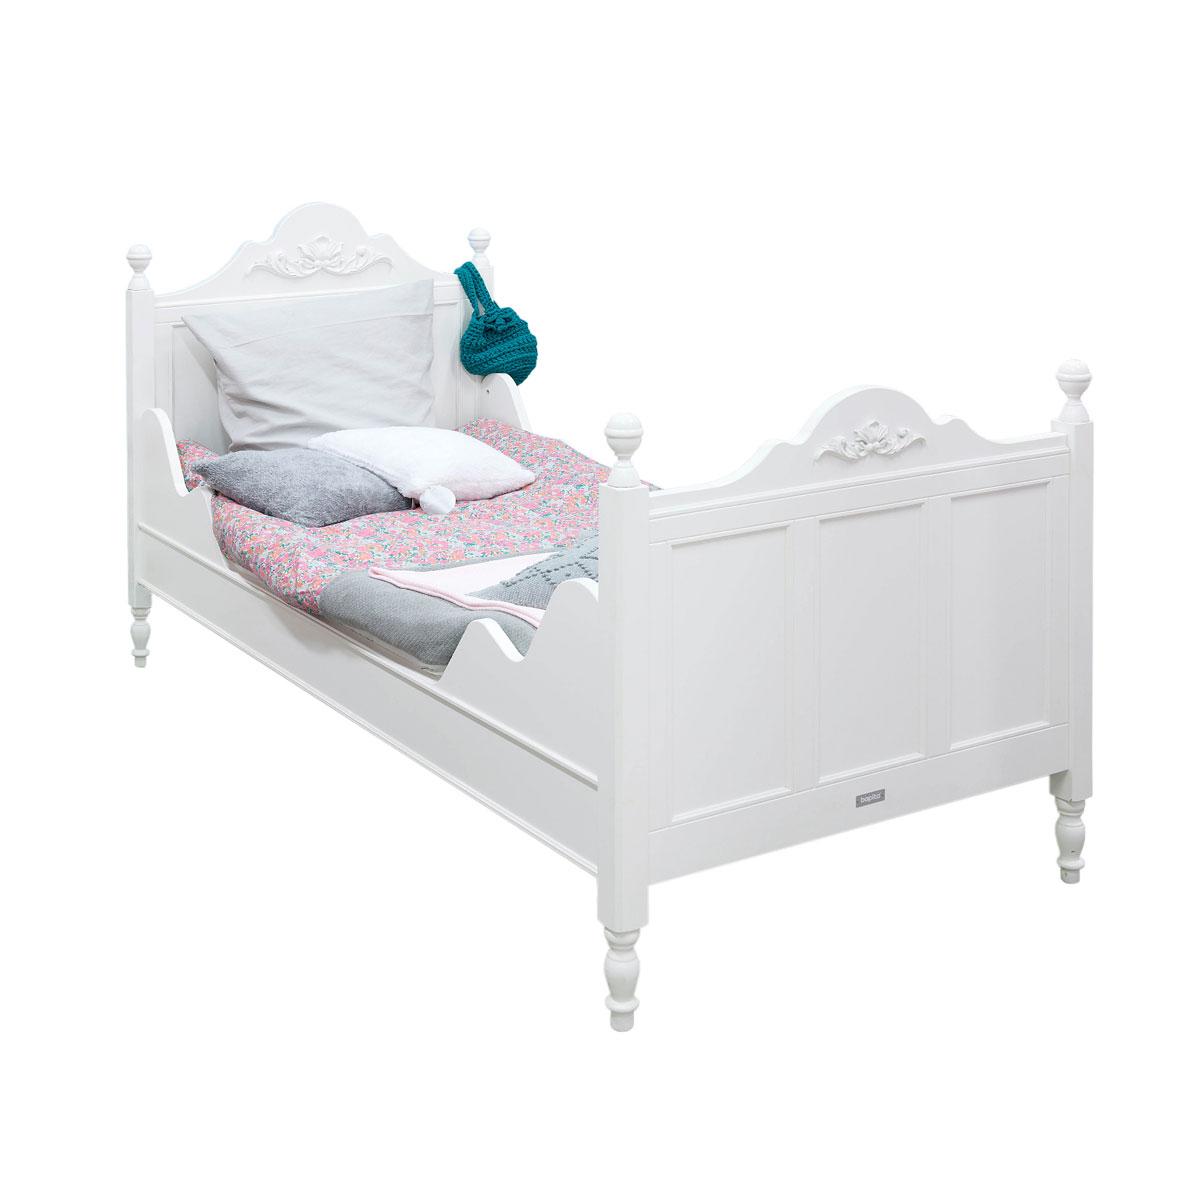 Full Size of Bopita Romantic Bett 90x200 Cm Betten Mit Stauraum Gebrauchte Günstig Kaufen Bonprix Oschmann Weiß Schubladen Moebel De Schlafzimmer Jabo Team 7 Bett Betten 90x200